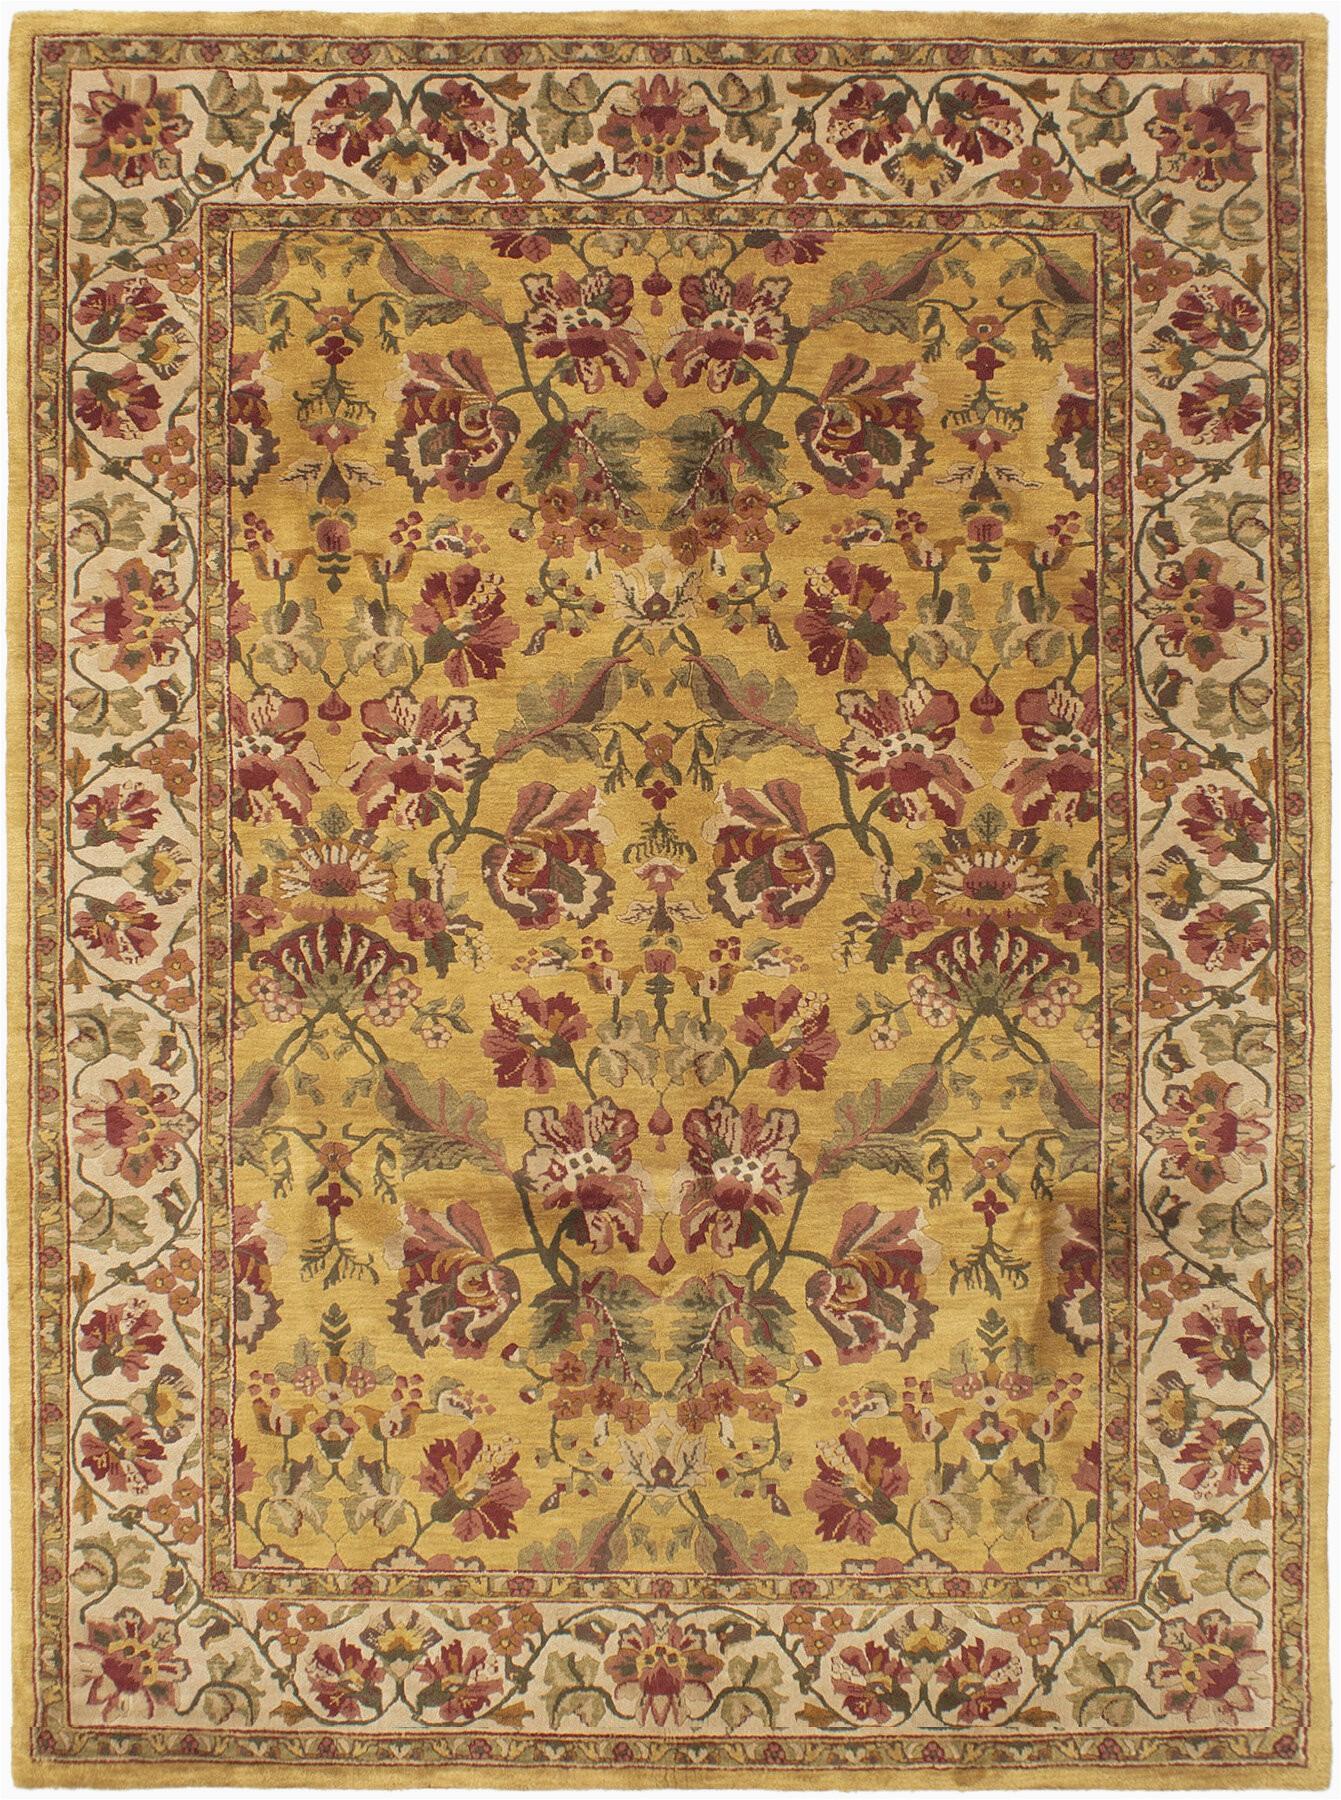 minatare hand knotted wool dark gold area rug